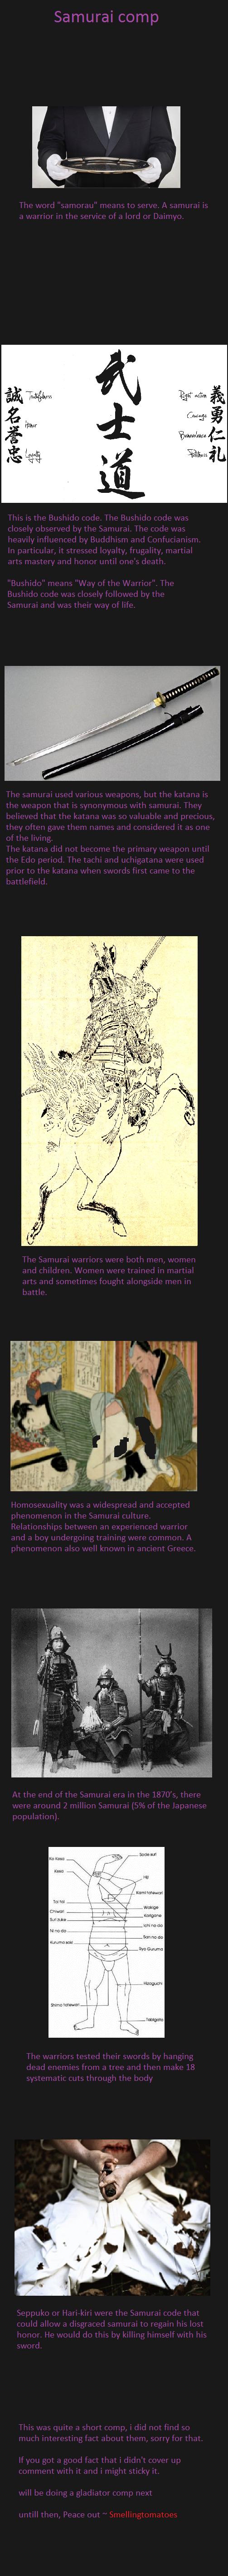 Samurai comp. . samurai